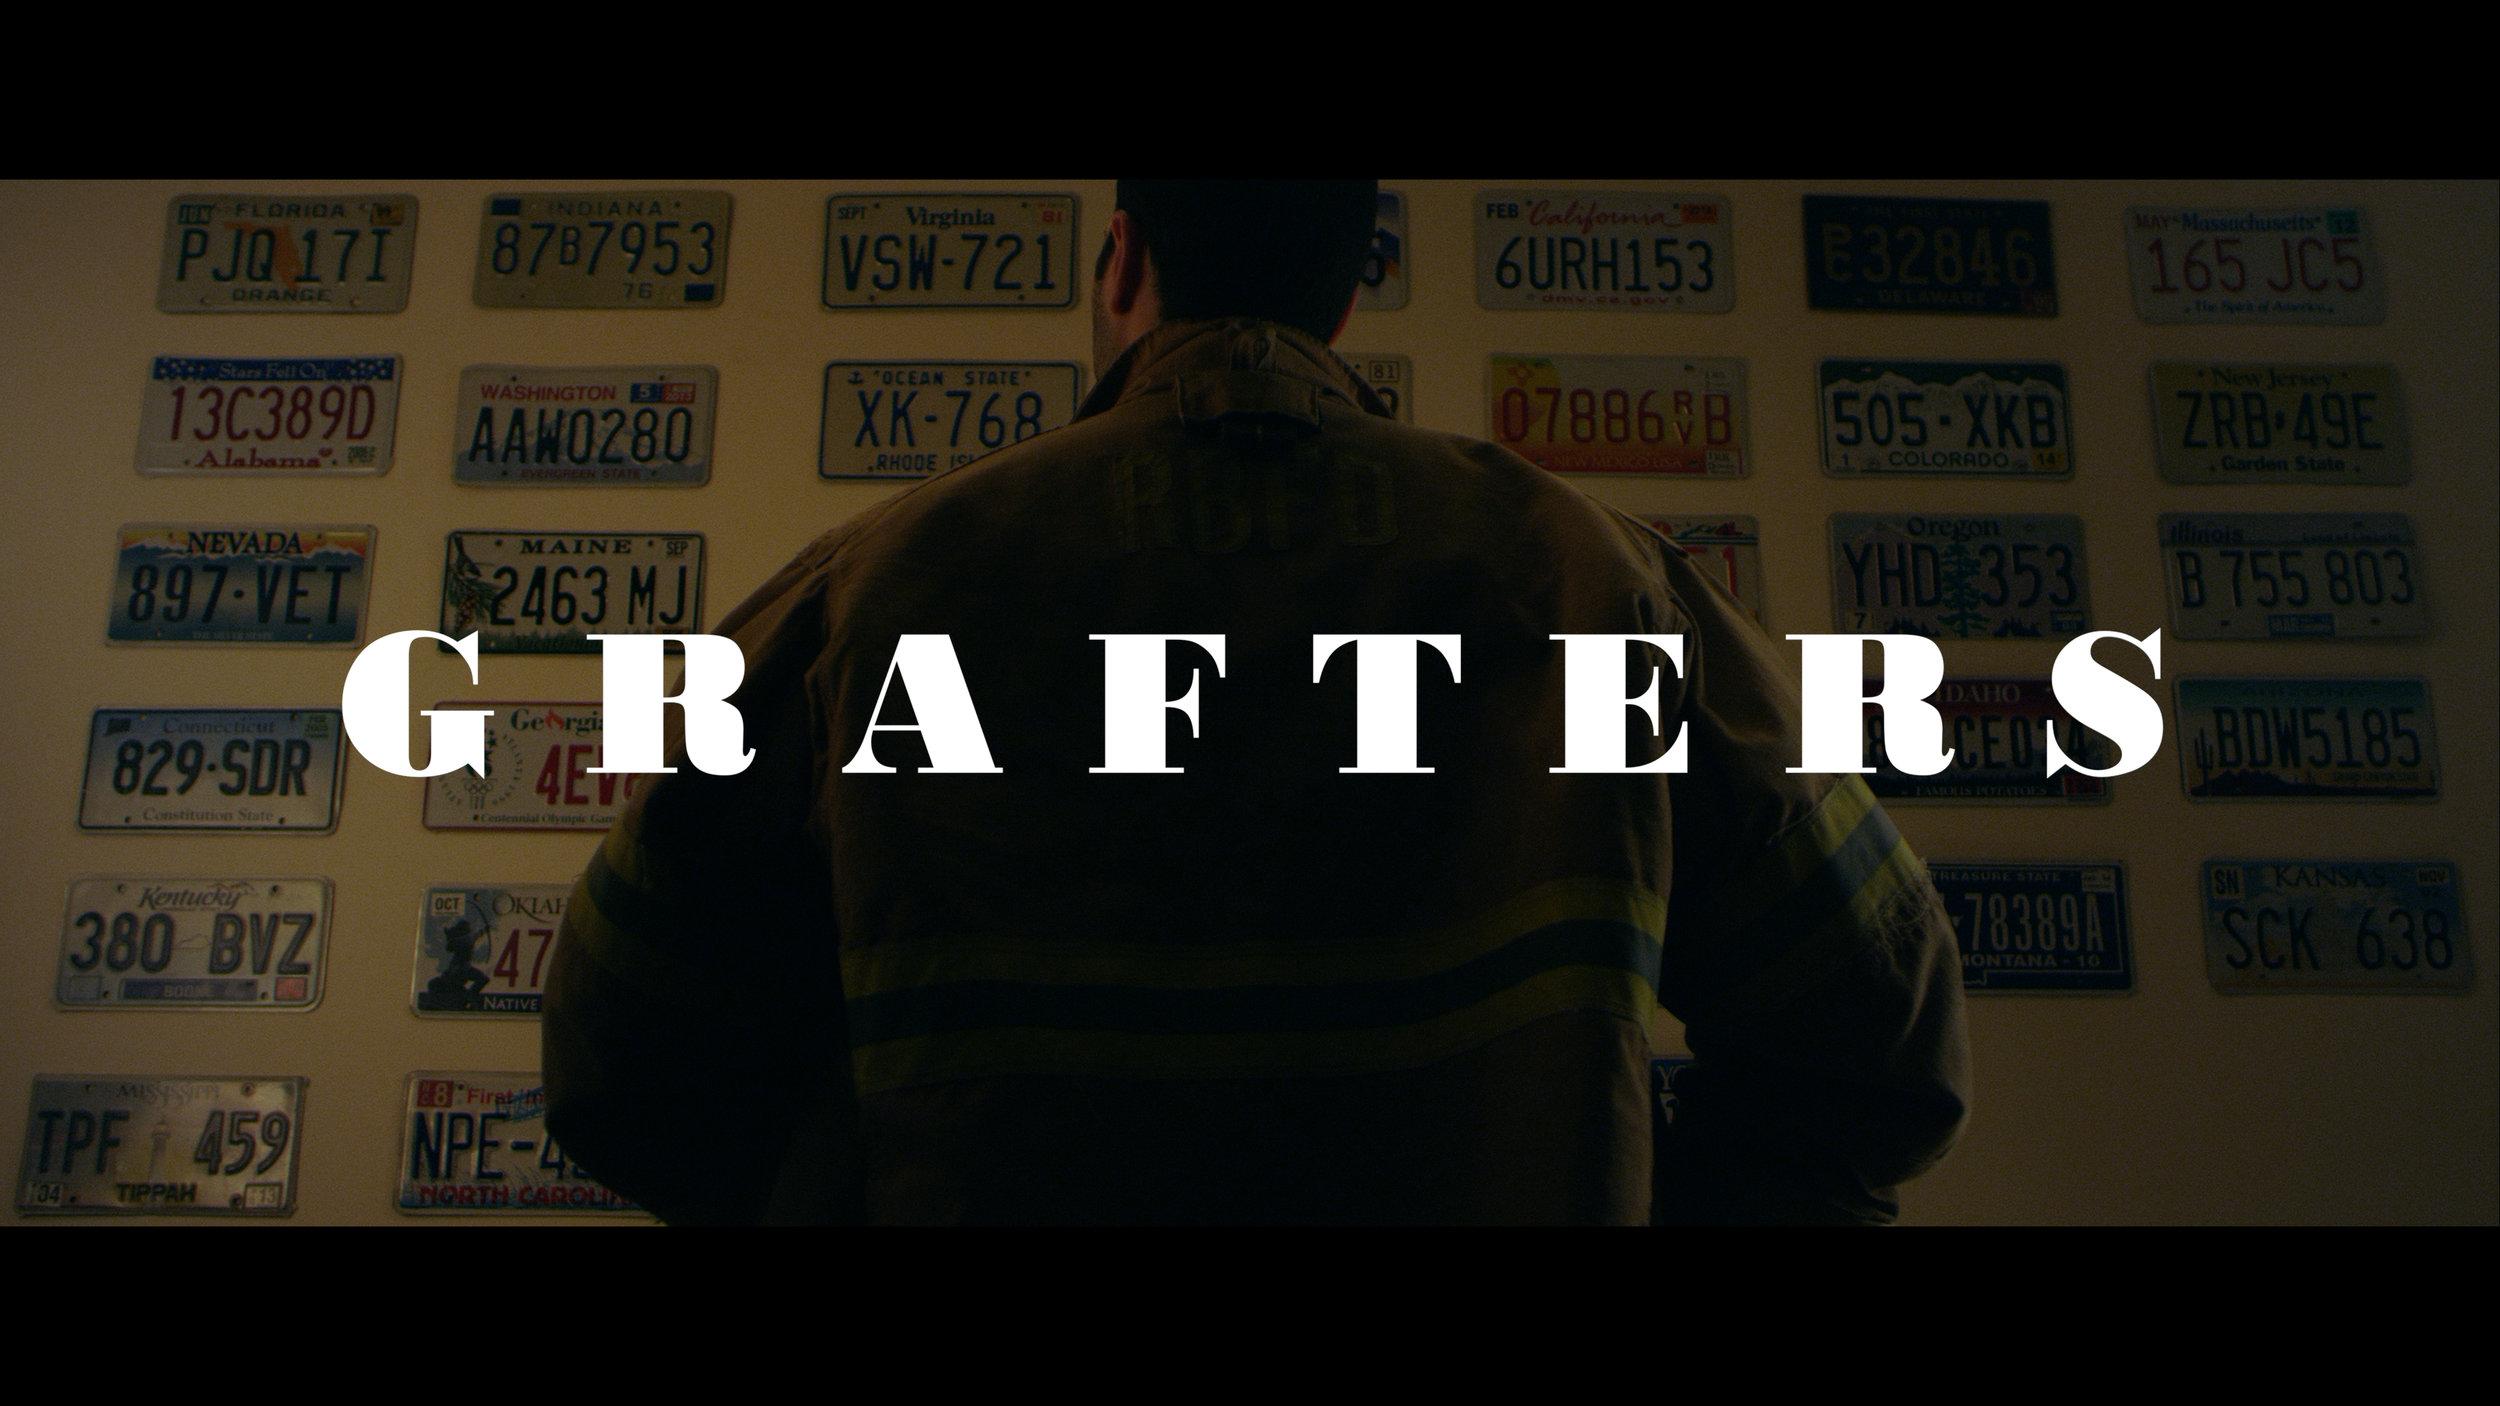 Grafters_NJD.jpg